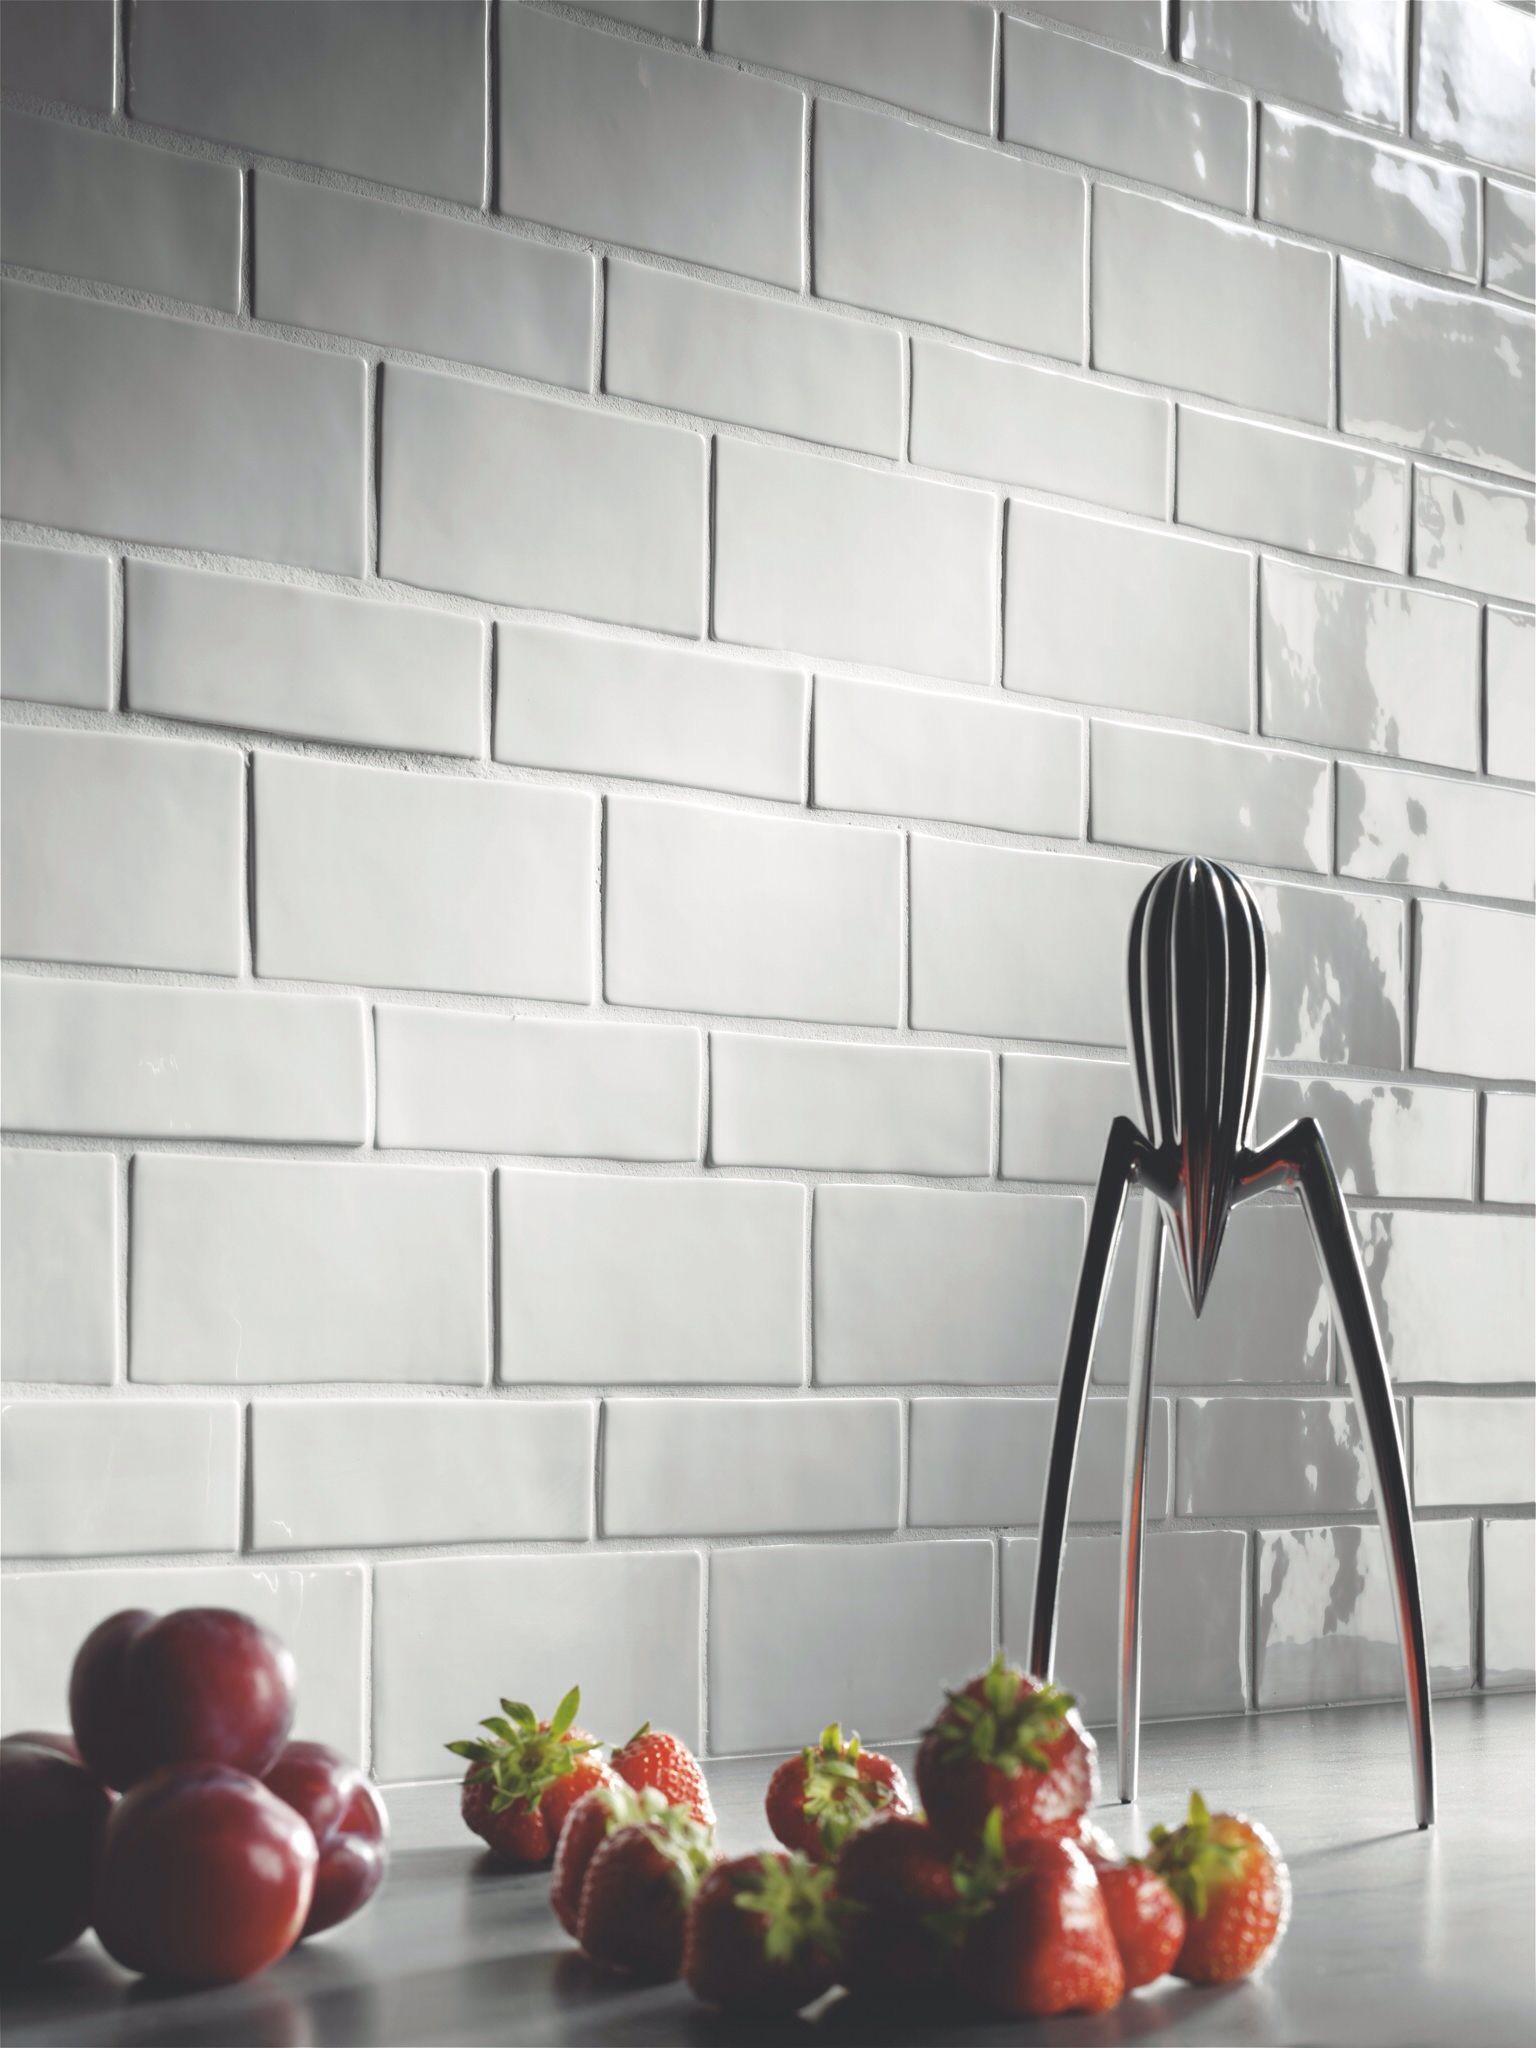 Horus Art Broadway Latte Horus Art Kitchen Wall Tiles